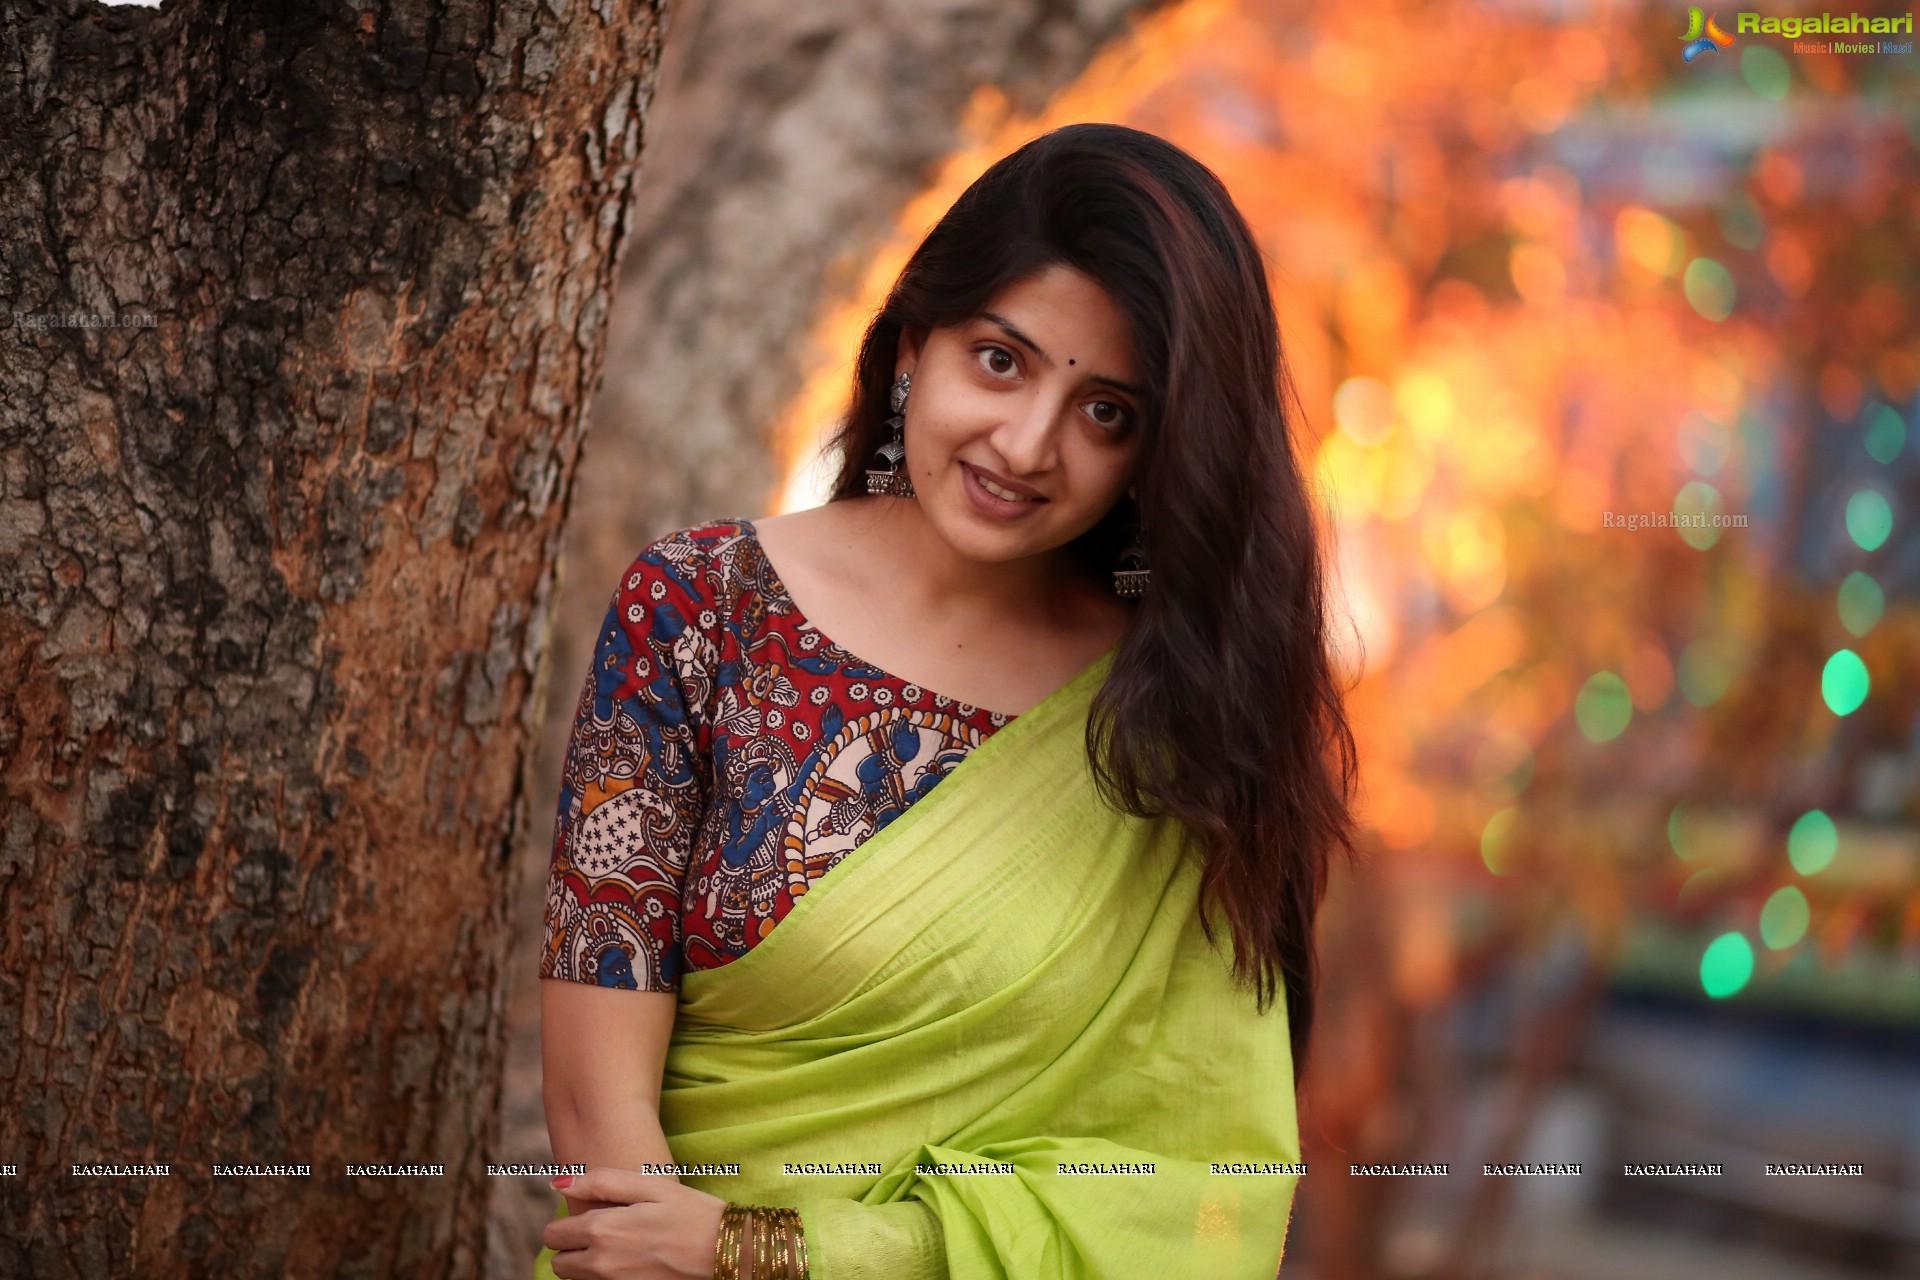 poonam kaur lal (high definition) image 12   telugu movie actress